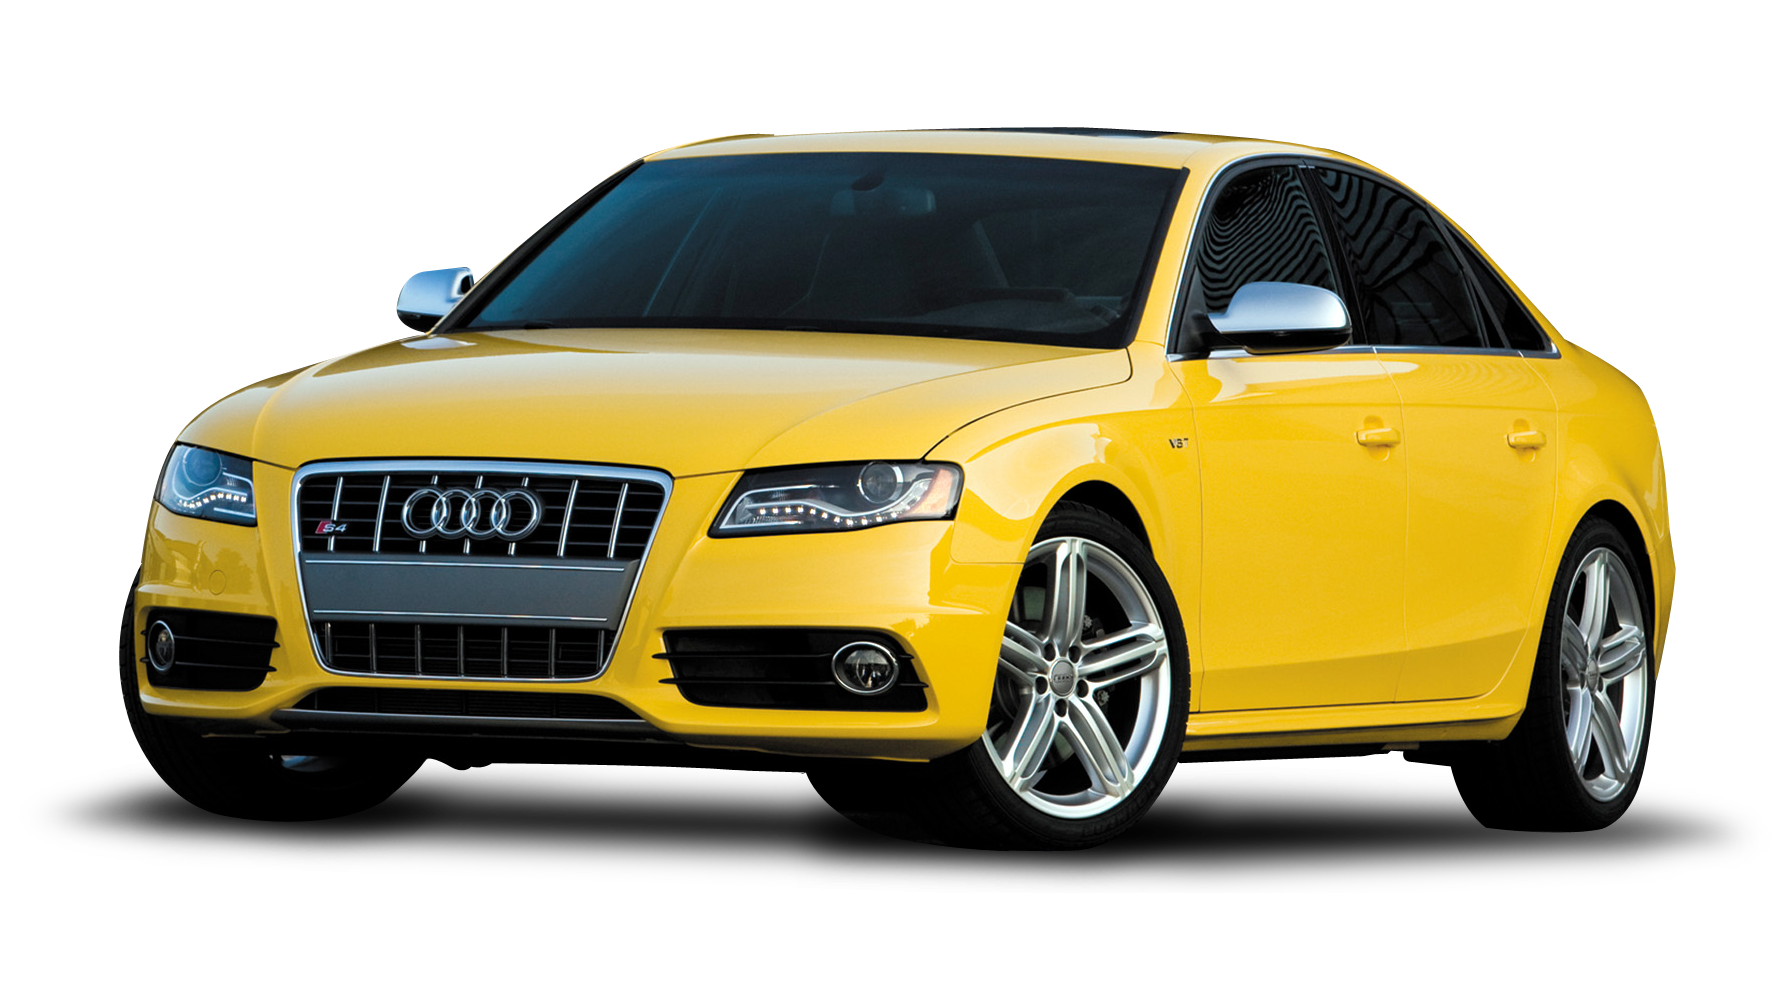 Audi car clipart image transparent stock Audi PNG Car Images, free transparent audi clipart images - Free ... image transparent stock